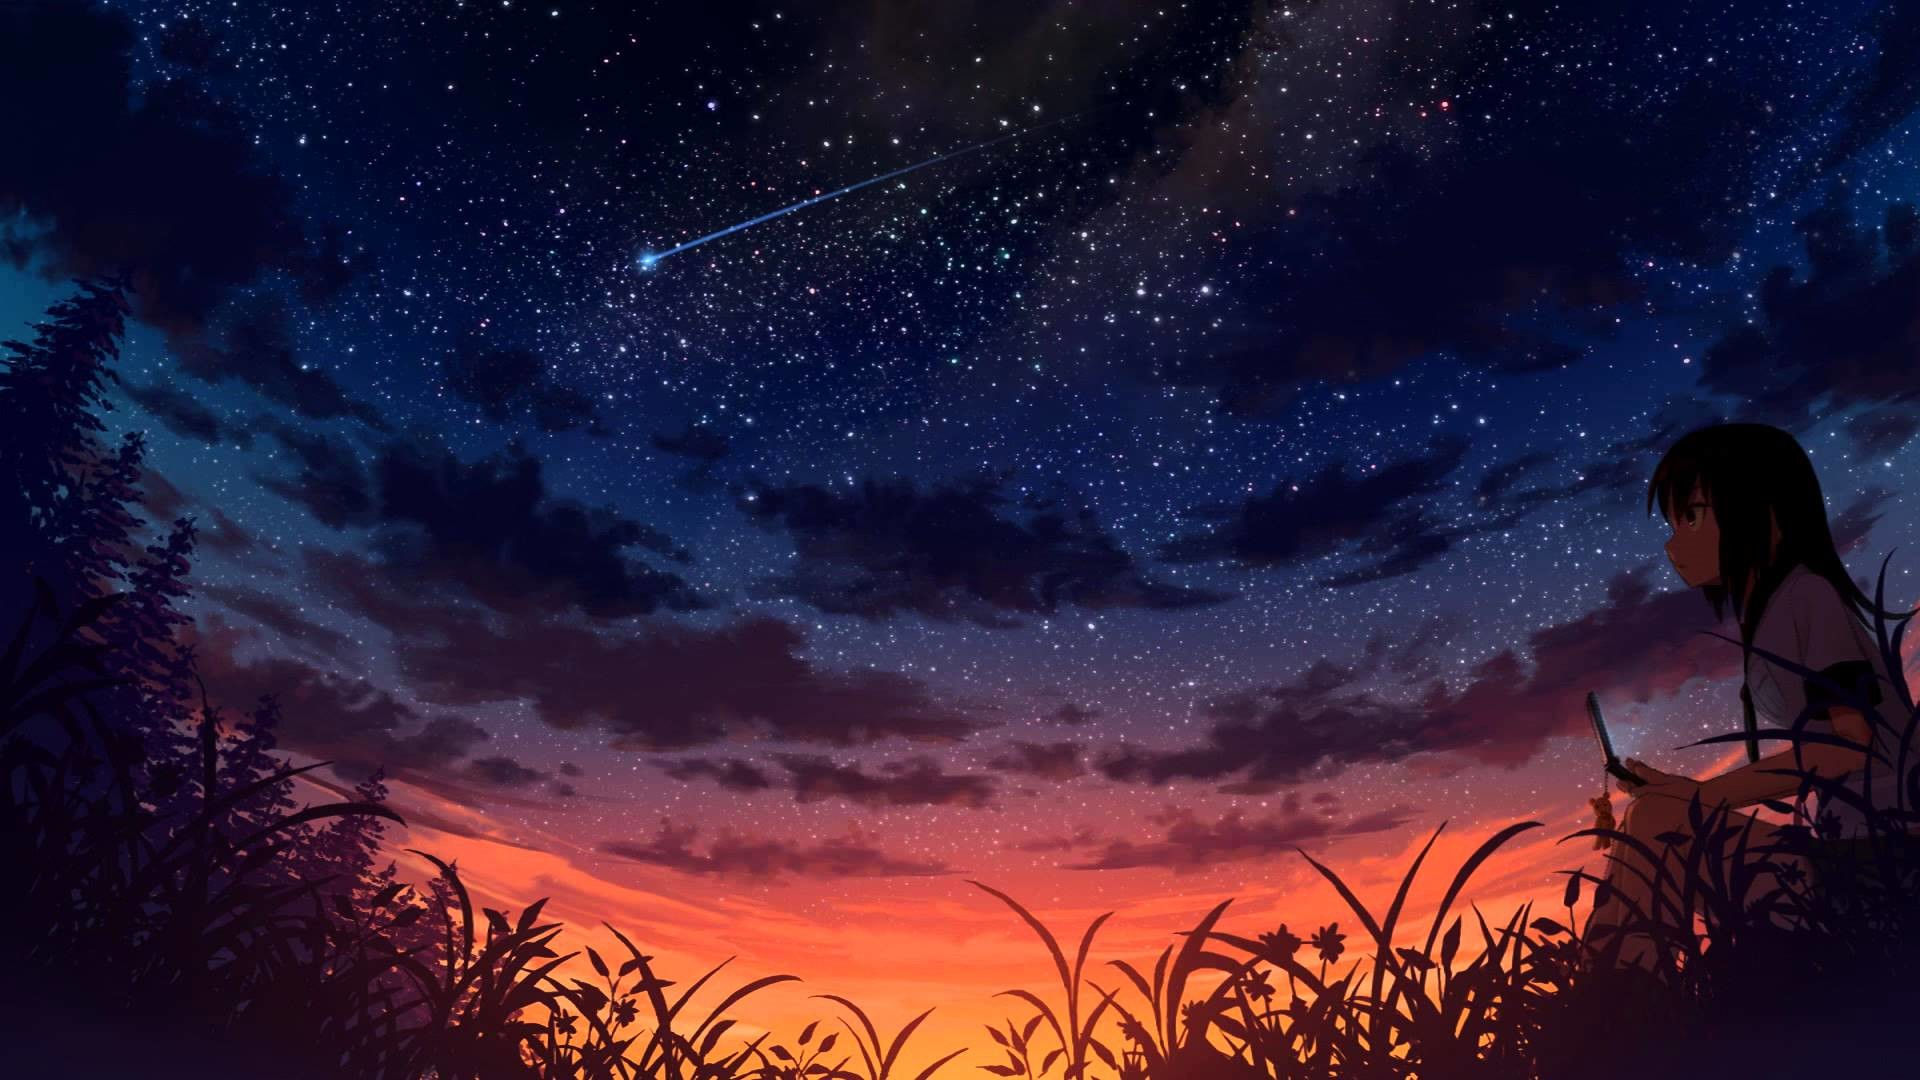 Milky Way Wallpapers – Full HD wallpaper search   dye inspiration    Pinterest   Hd wallpaper, Sky full and Beautiful sky